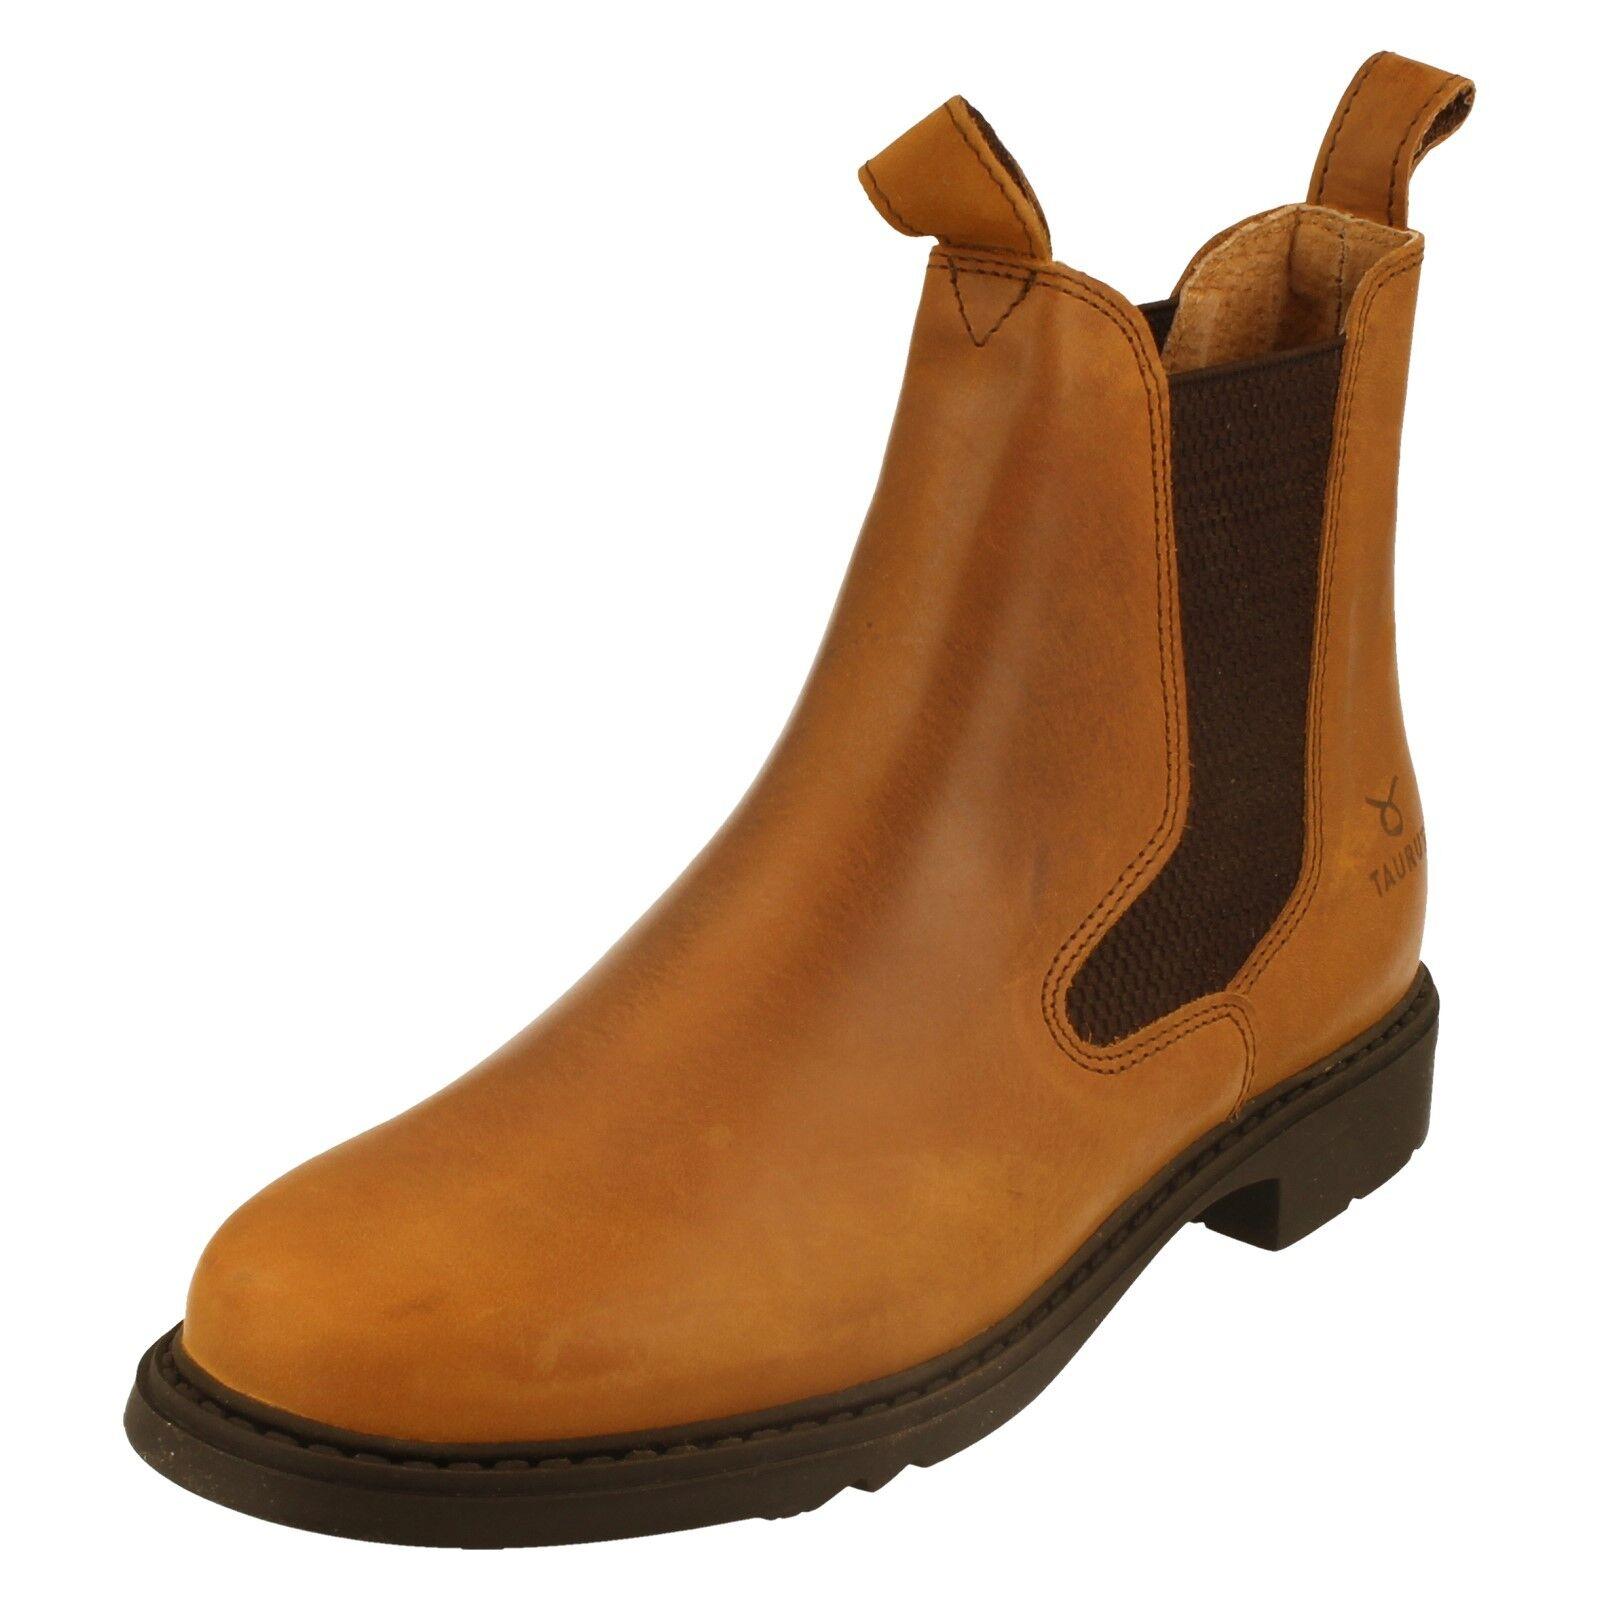 UNISEX Para TAURUS Pantalones Para UNISEX Equitación Botas - Palomino d03008